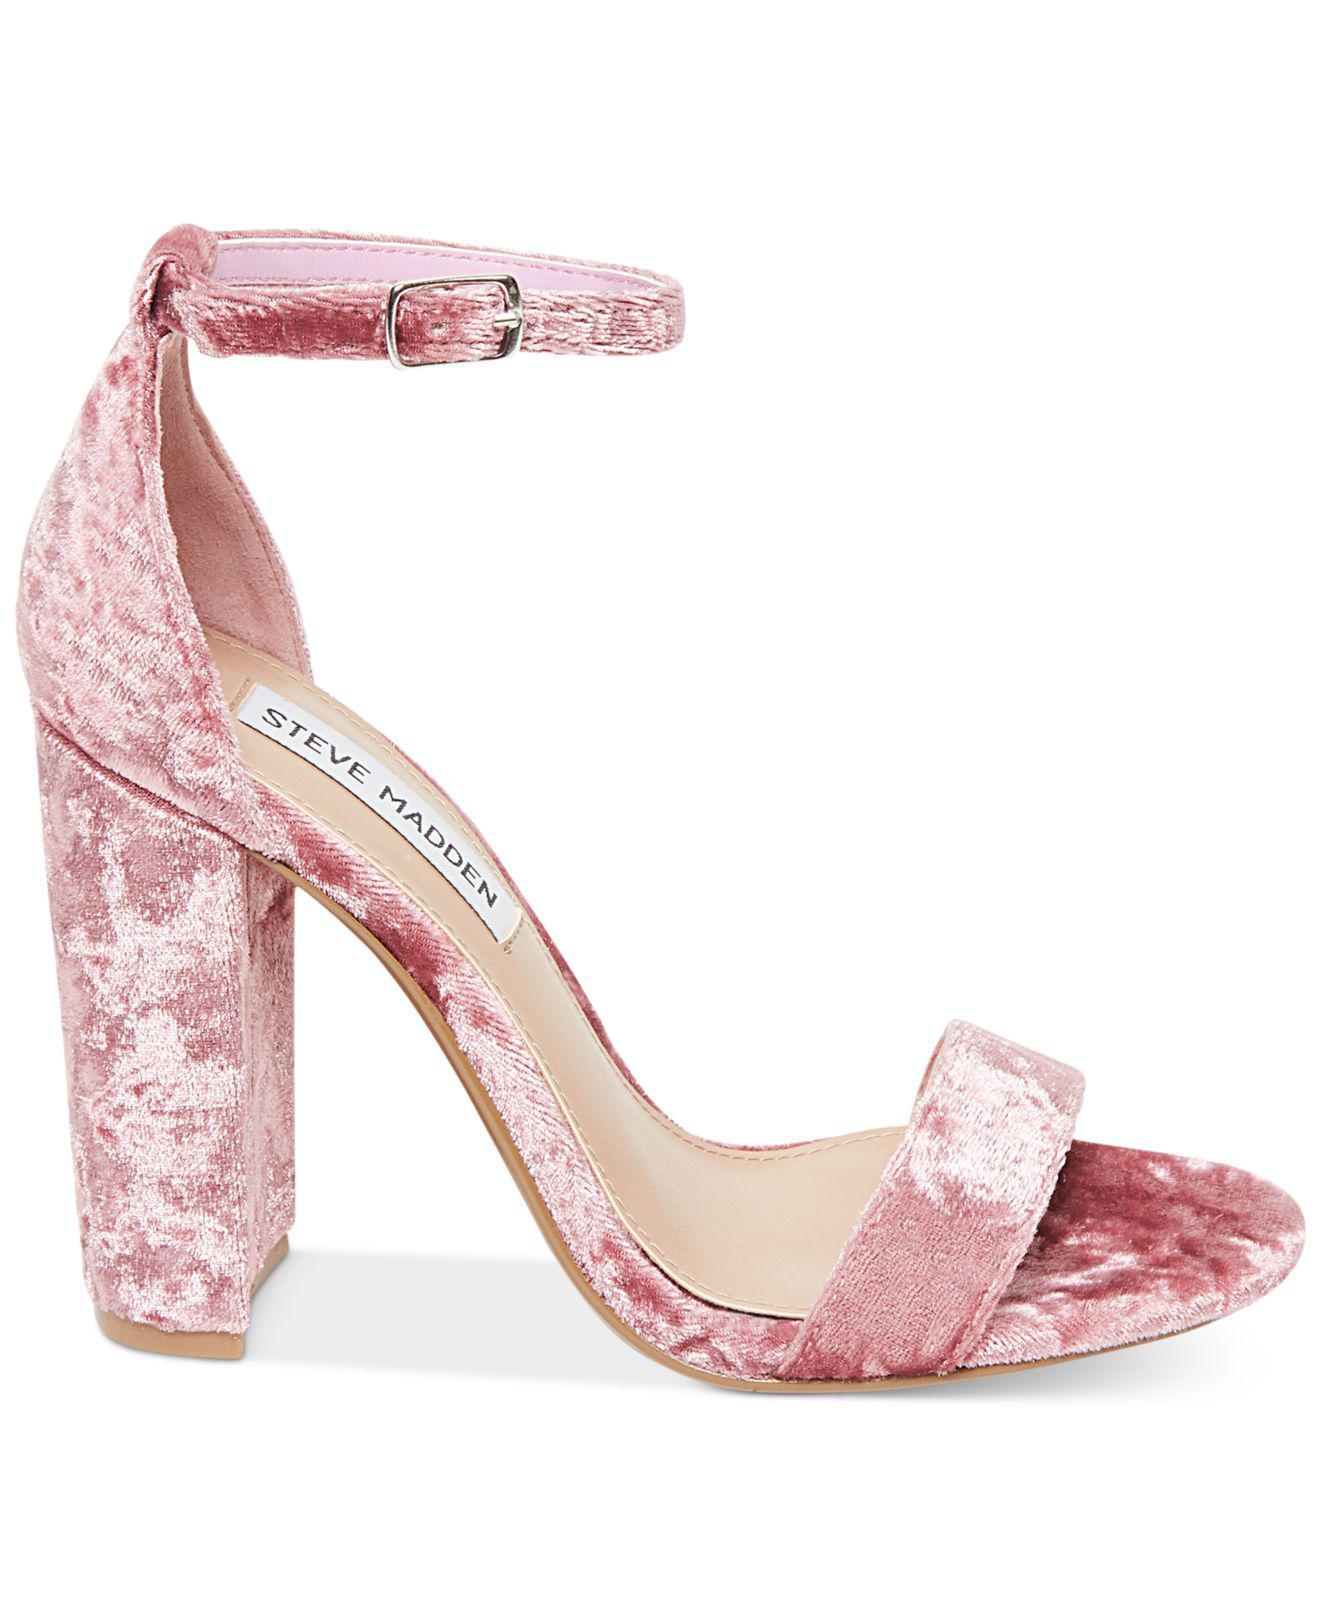 46792e22f79a Lyst - Steve Madden Women s Carrson Crushed Velvet Dress Sandals in Pink